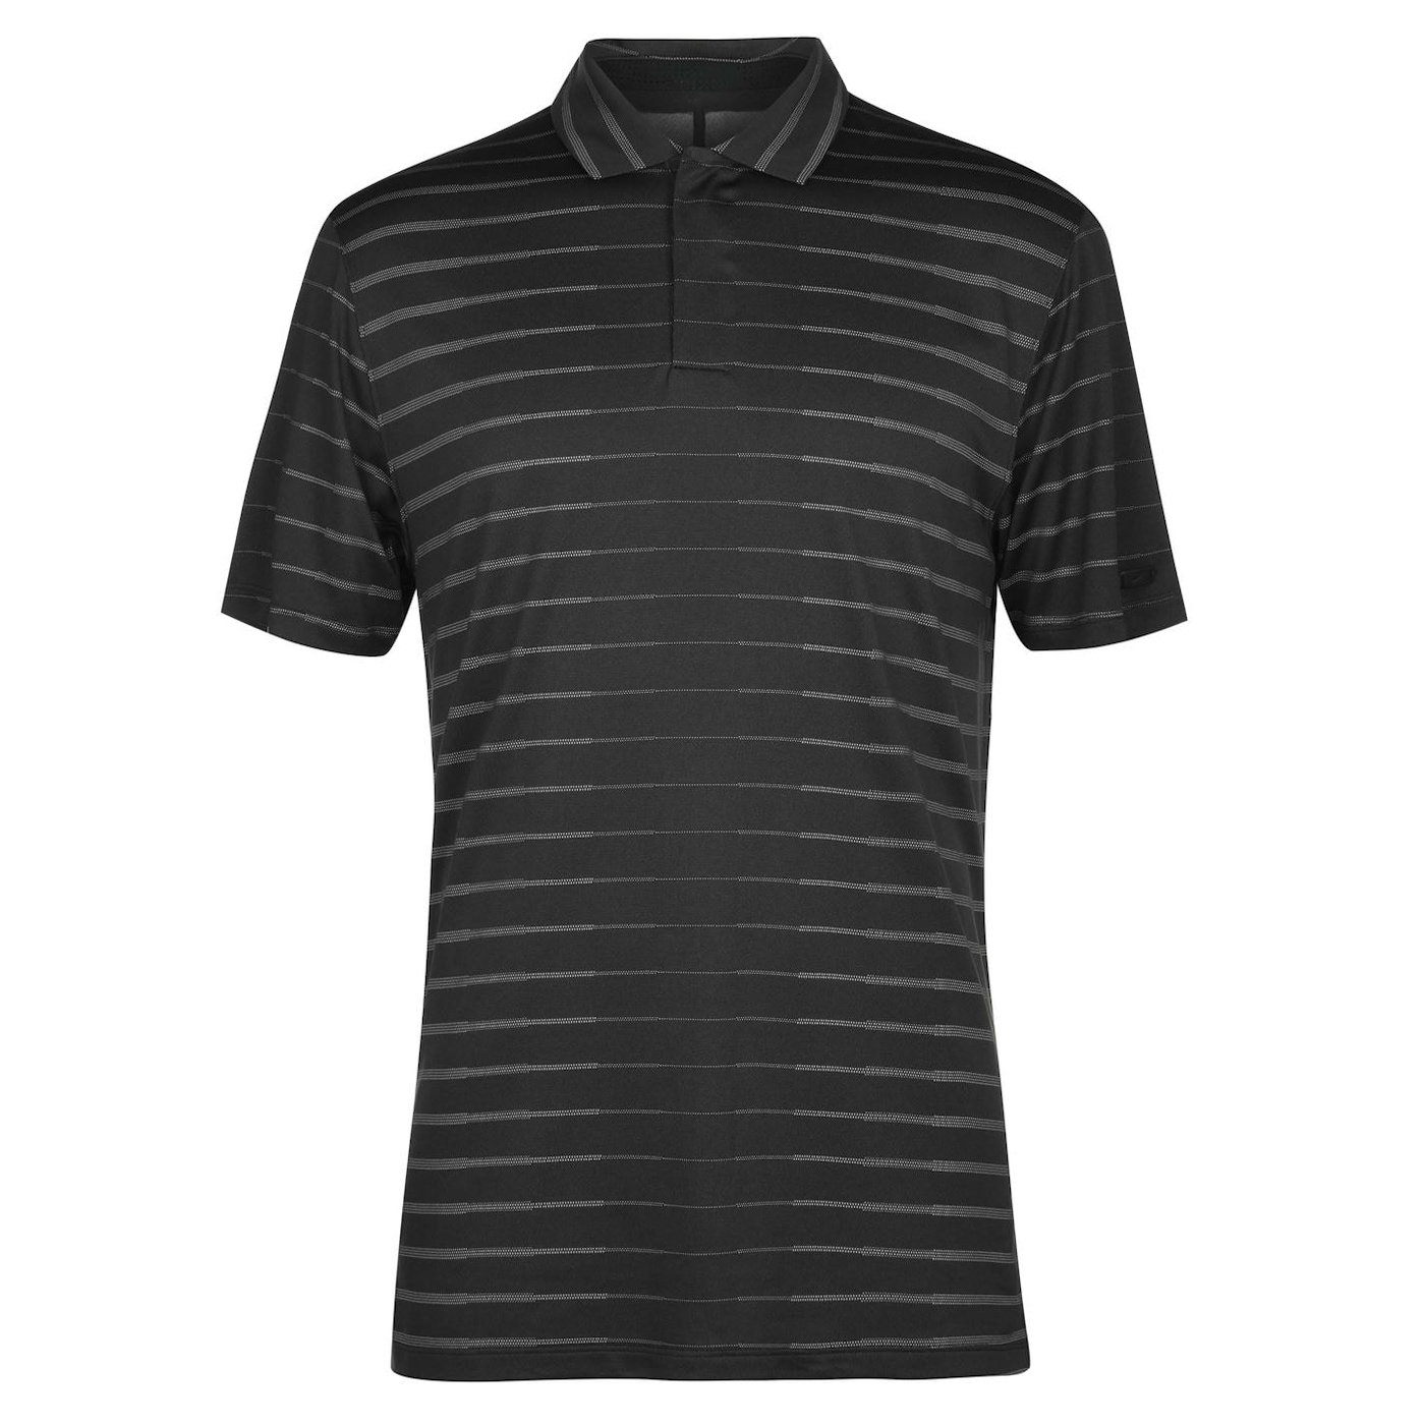 Nike Tiger Woods Novelty Polo Shirt Mens